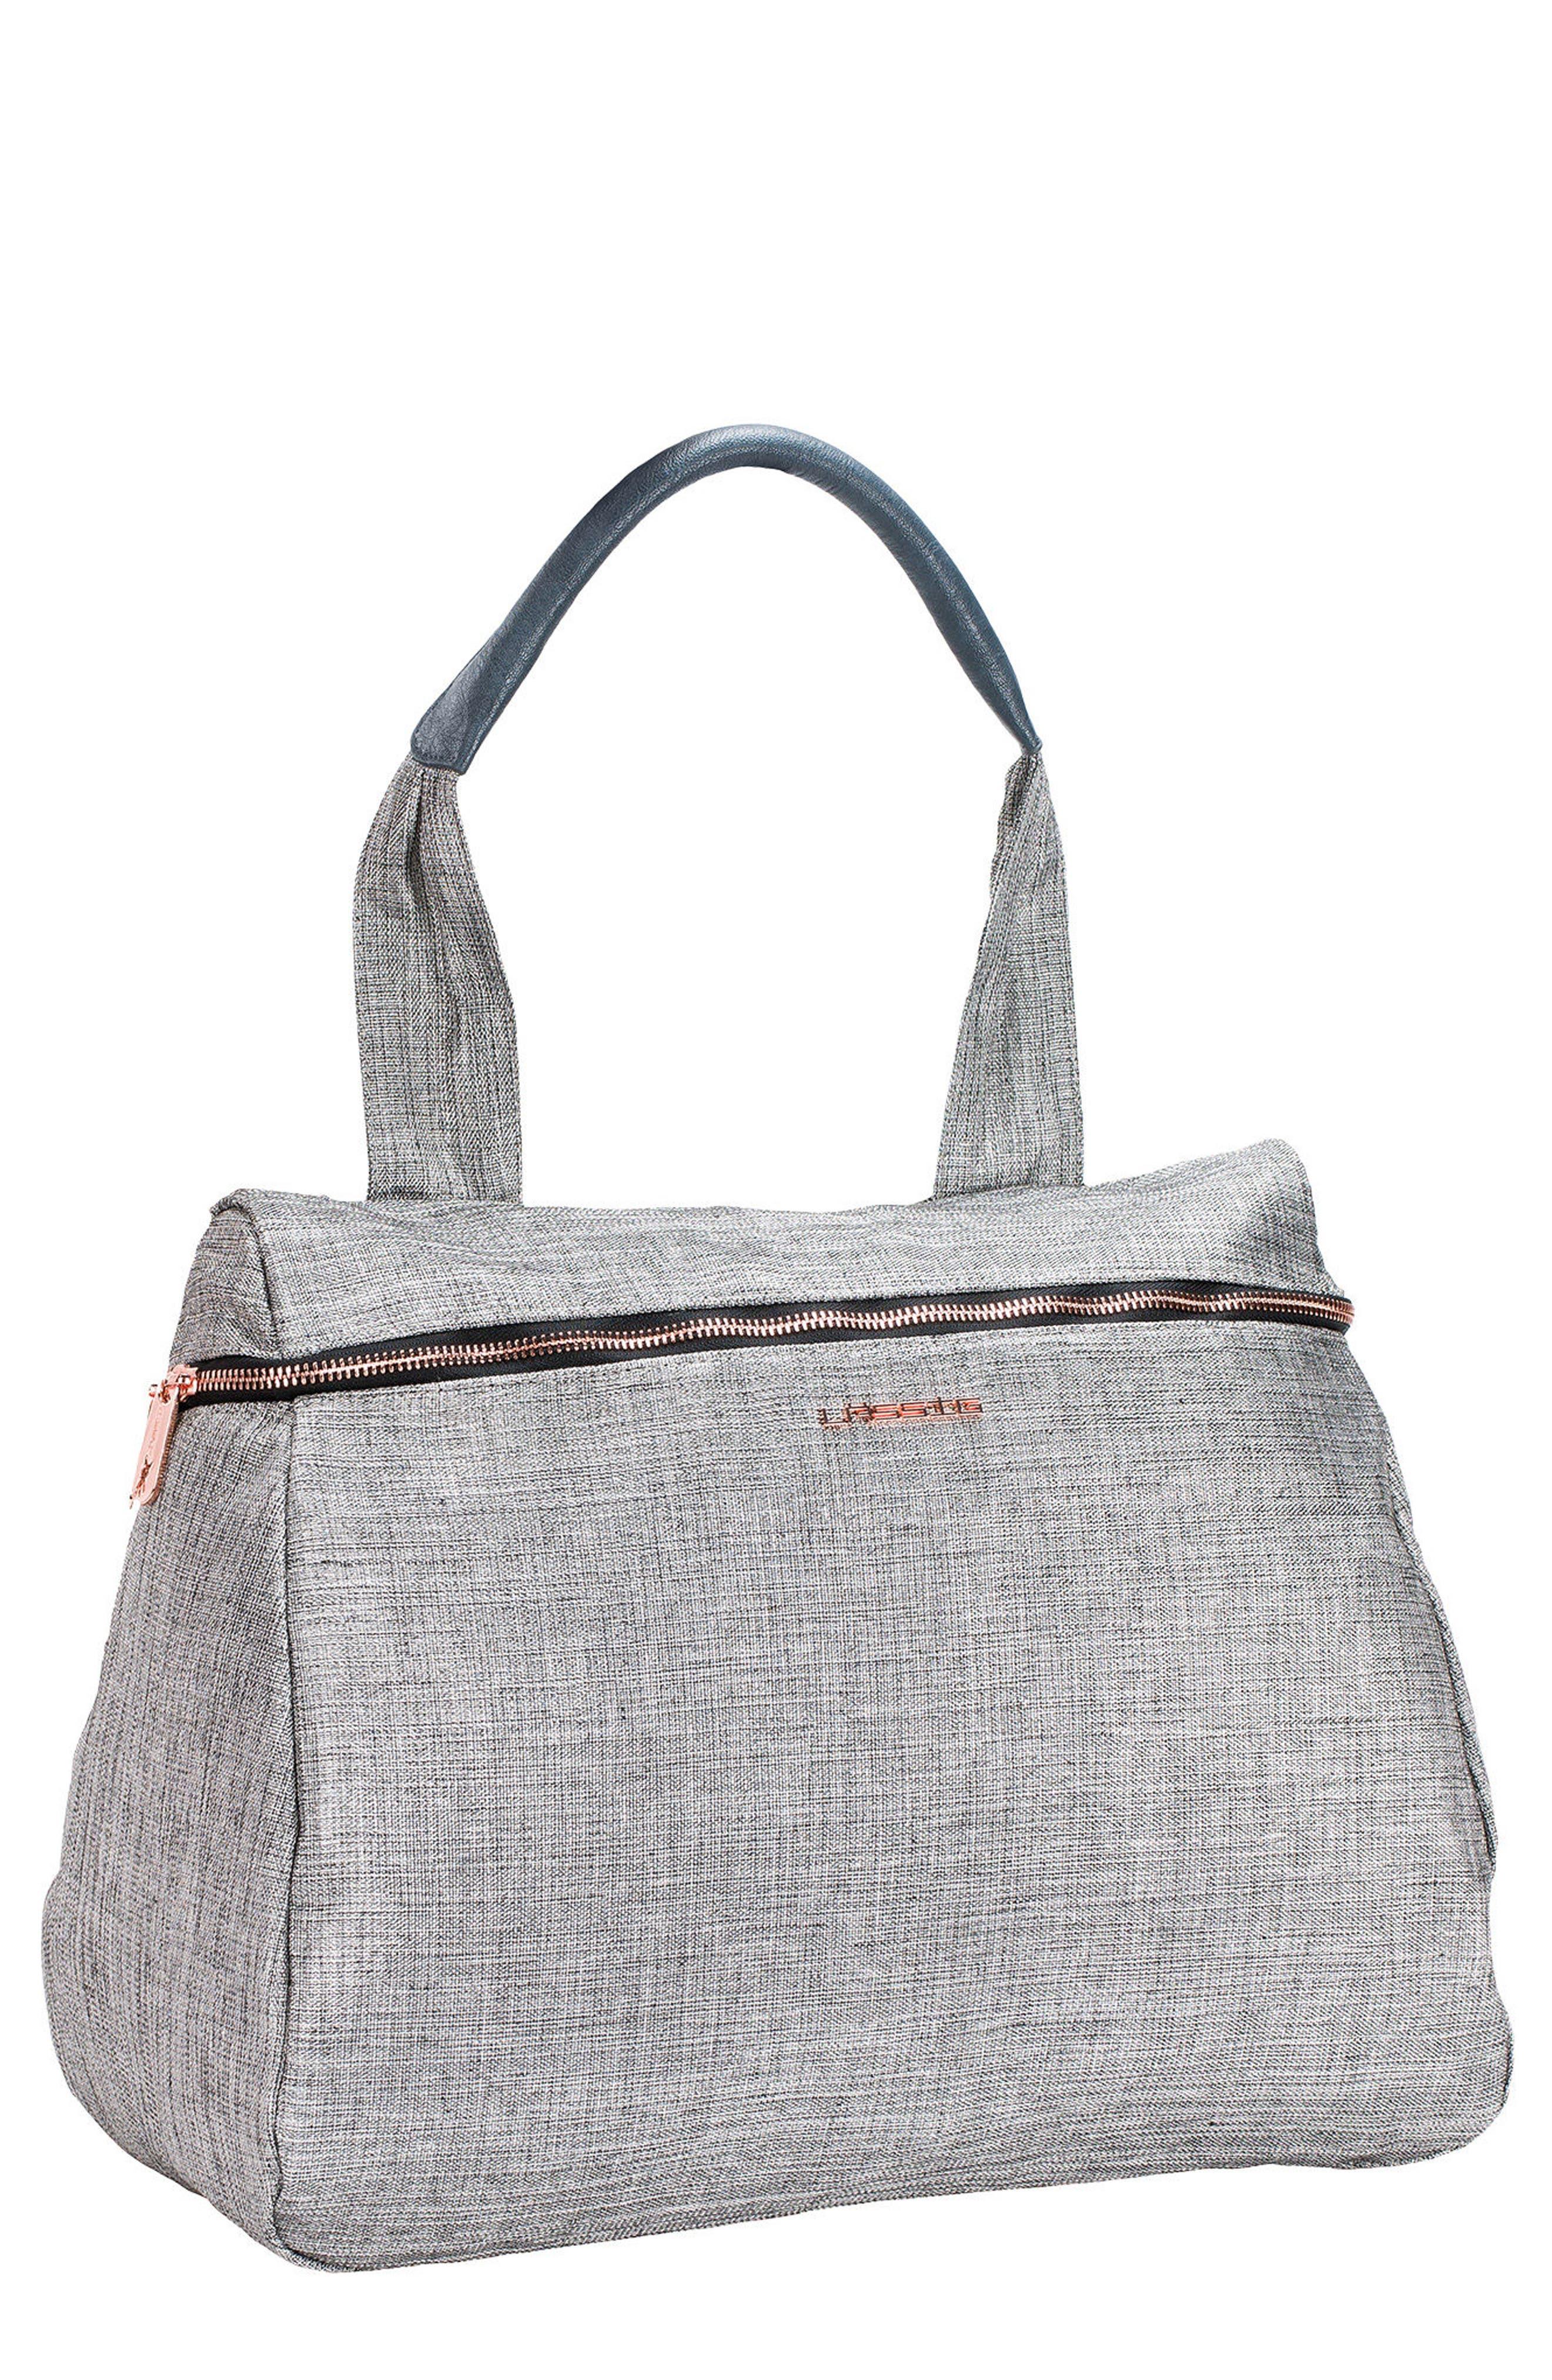 Glam Rosie Diaper Bag,                         Main,                         color, Anthracite Glitter